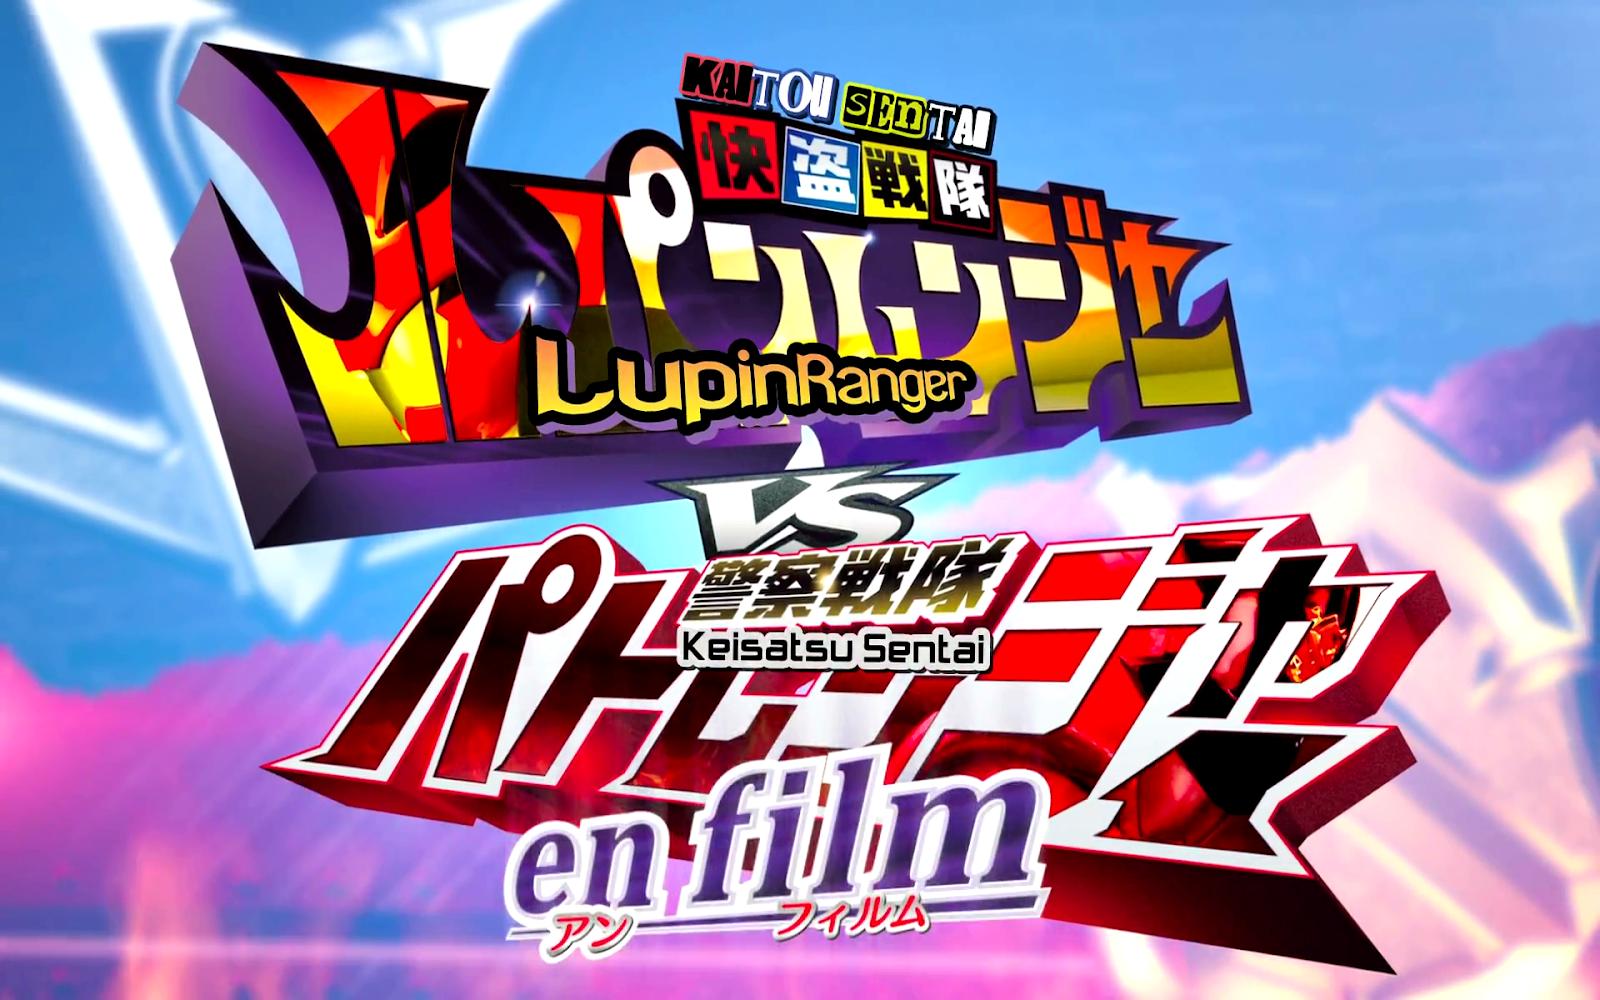 Kaitou Sentai Lupinranger Vs Keisatsu Sentai Patranger En Film 3